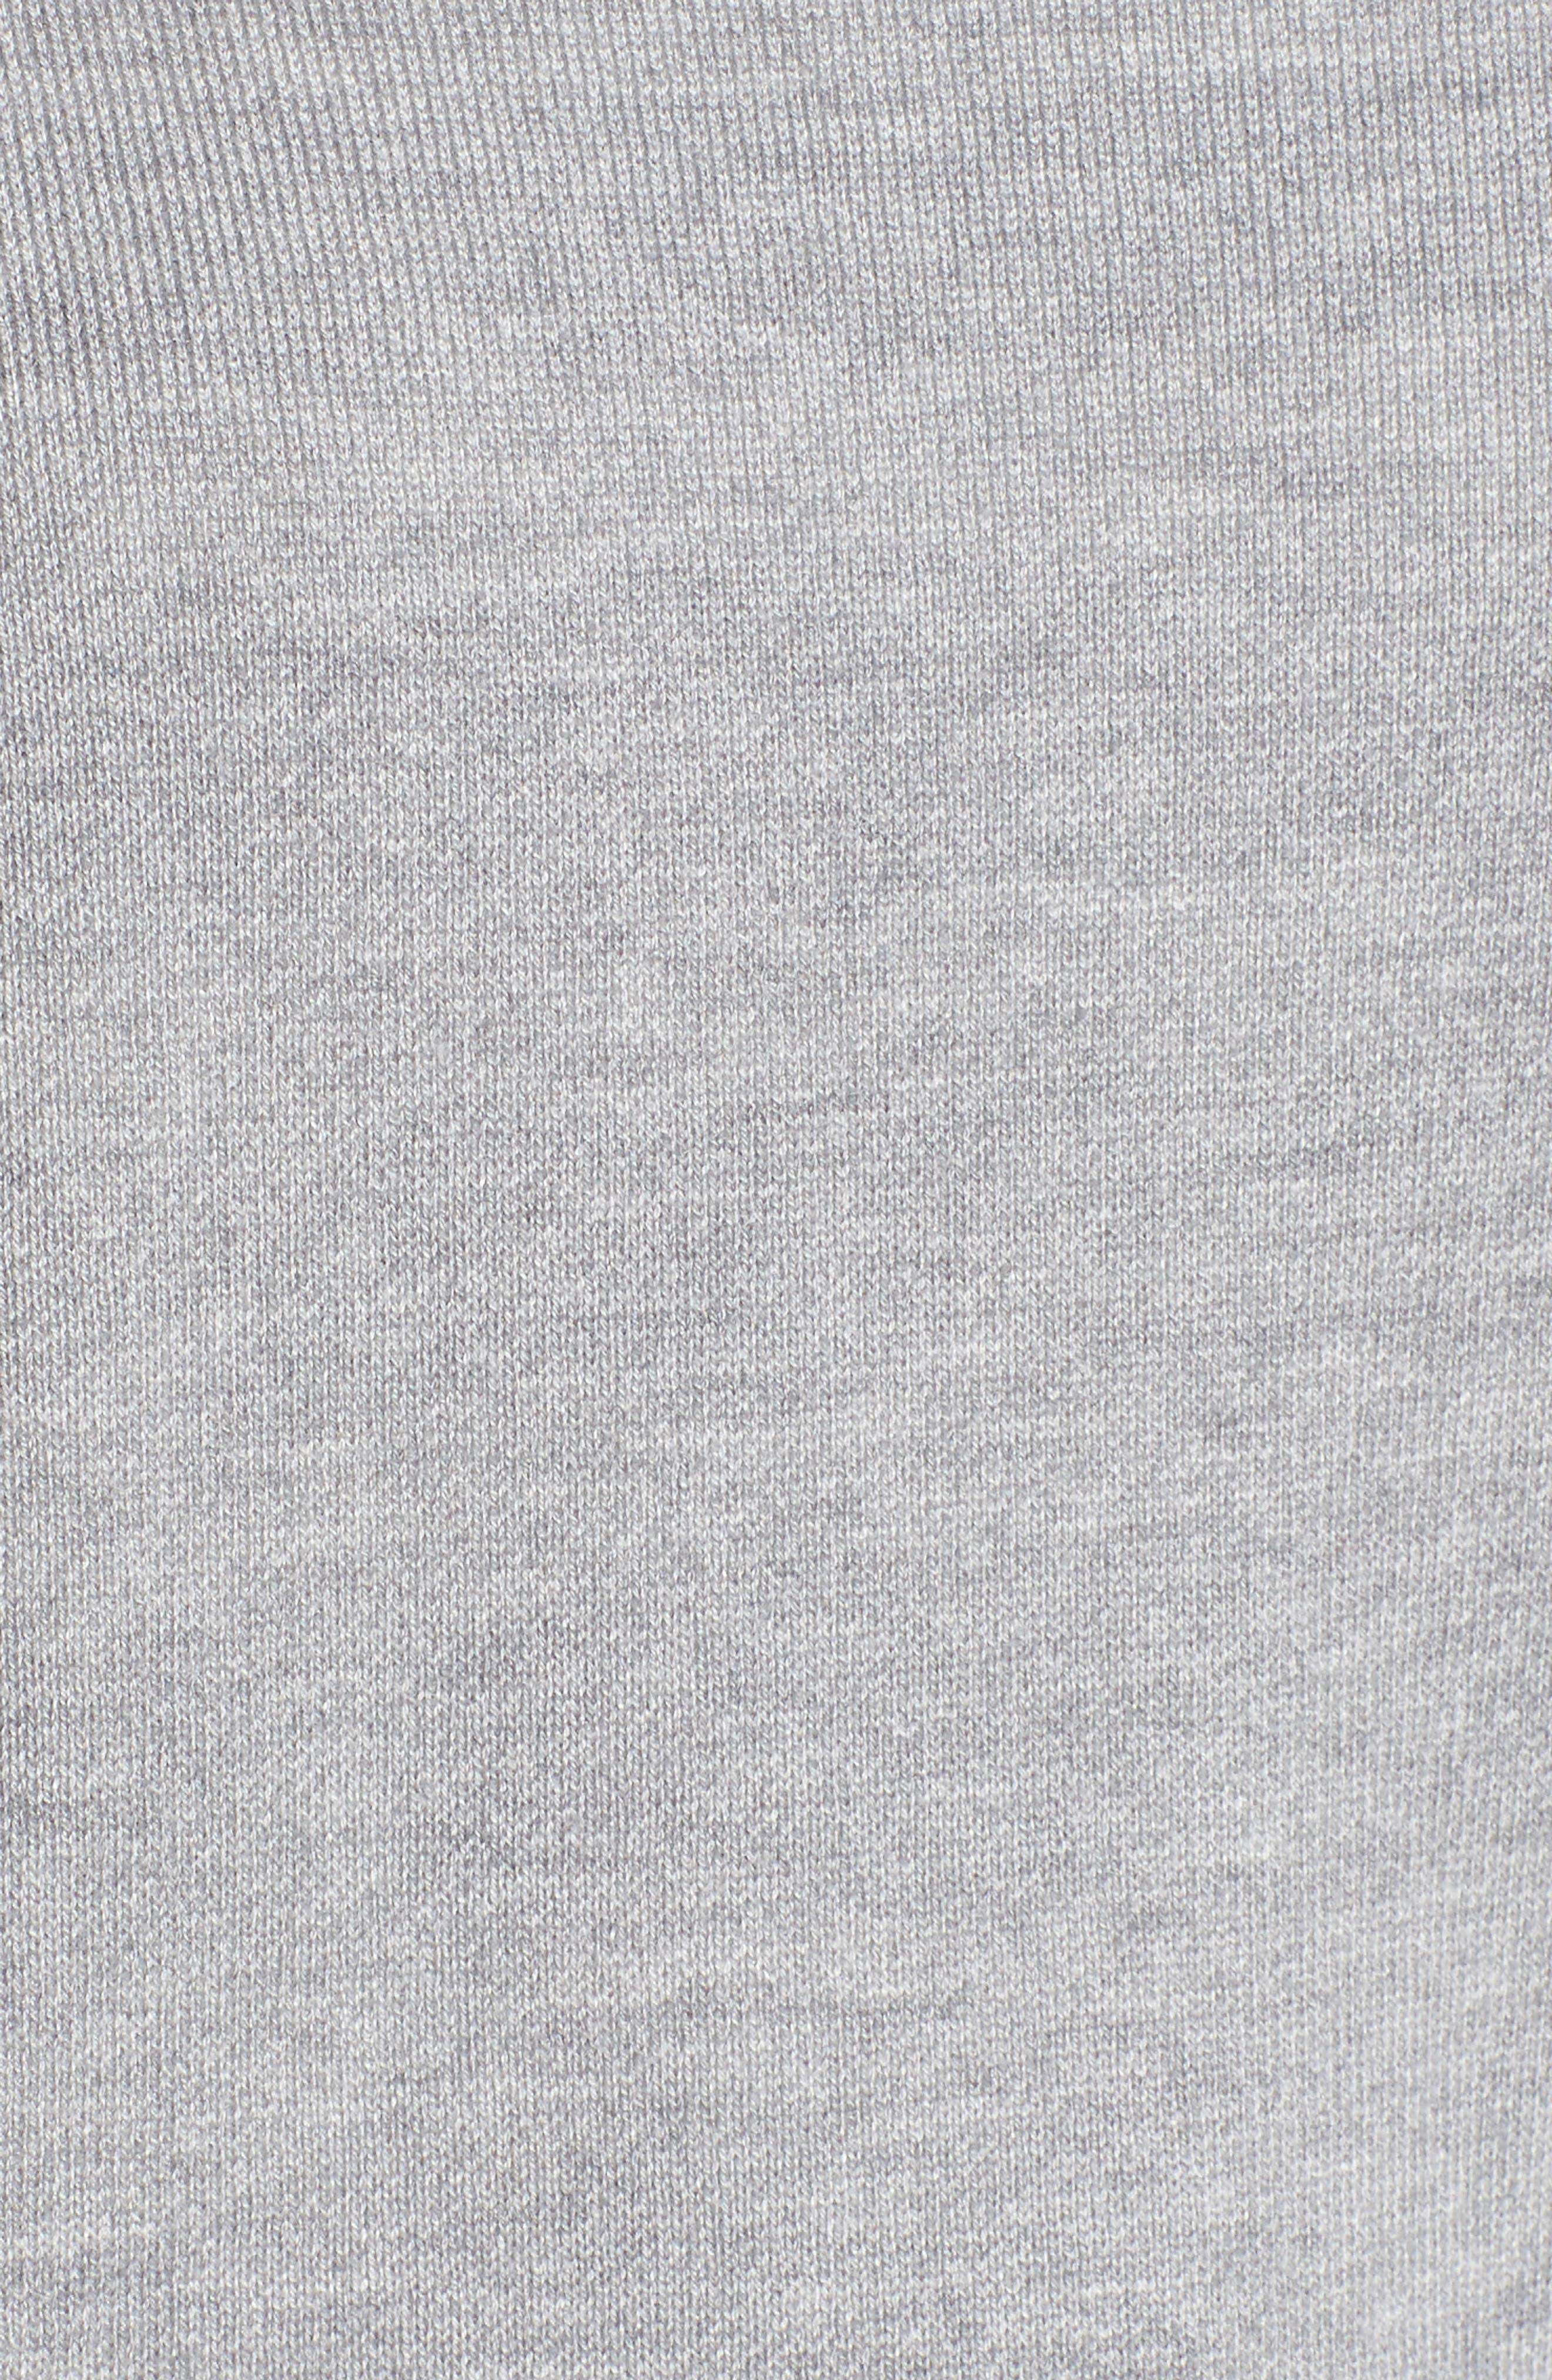 Devon Crossback Sweater,                             Alternate thumbnail 5, color,